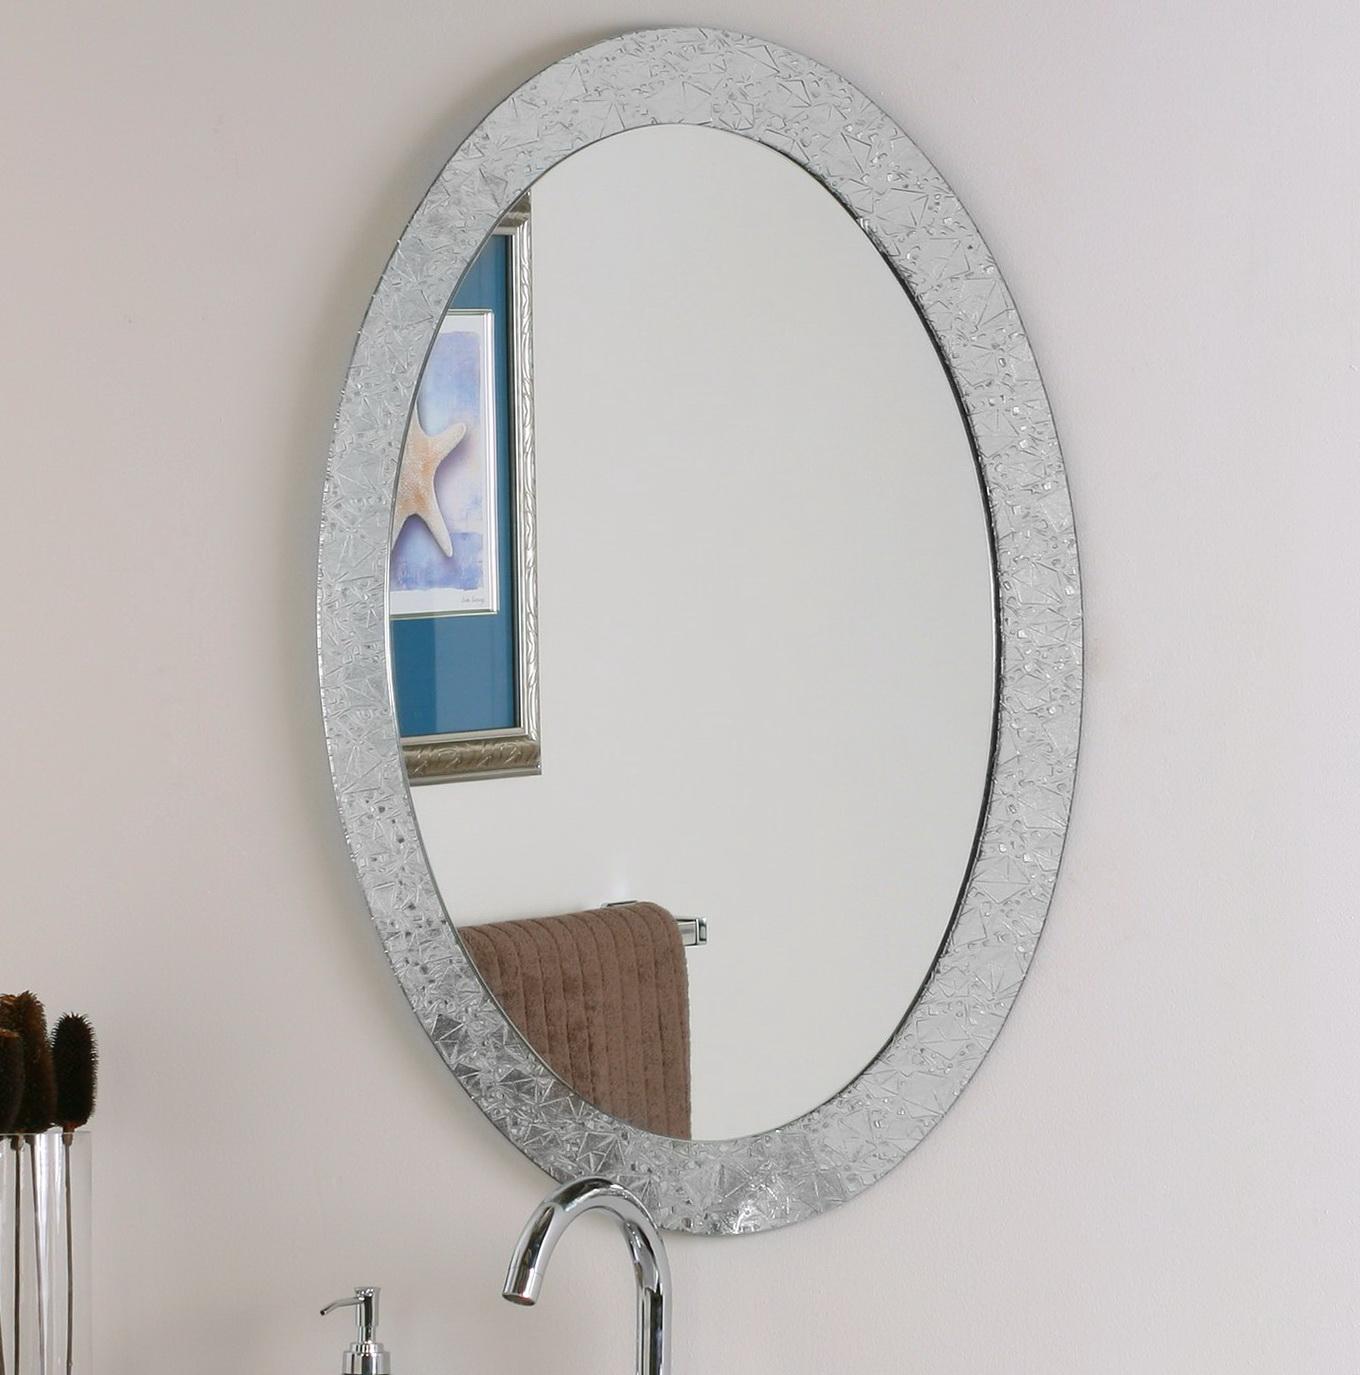 Oval Wall Mirrors Decorative